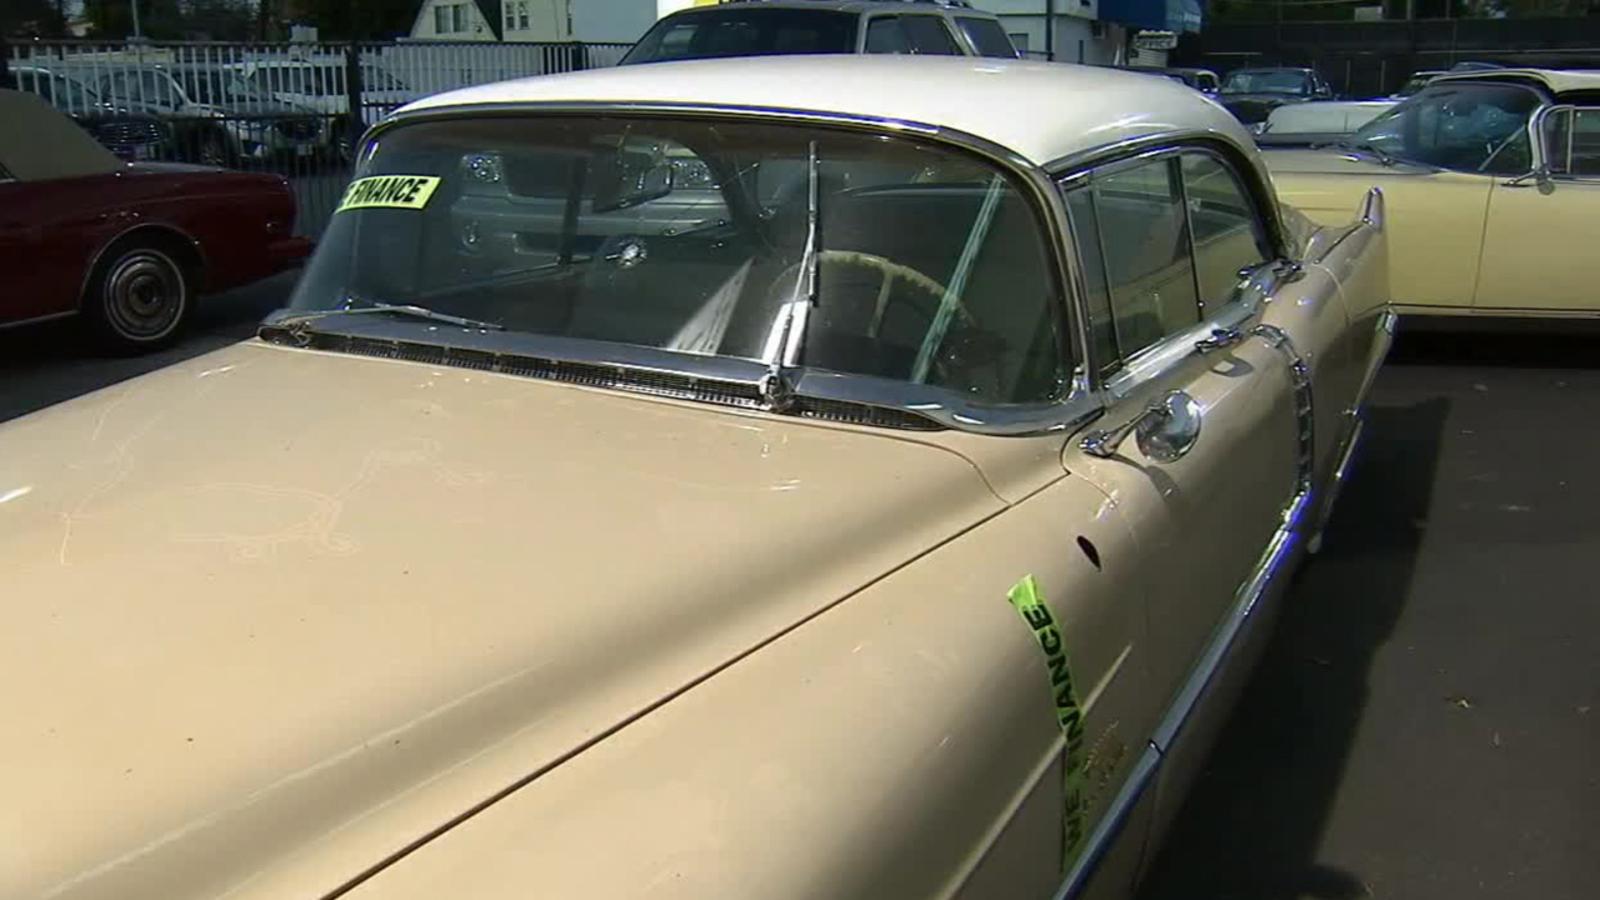 Cadillac dealership in West Hollywood vandalized - ABC7 ...